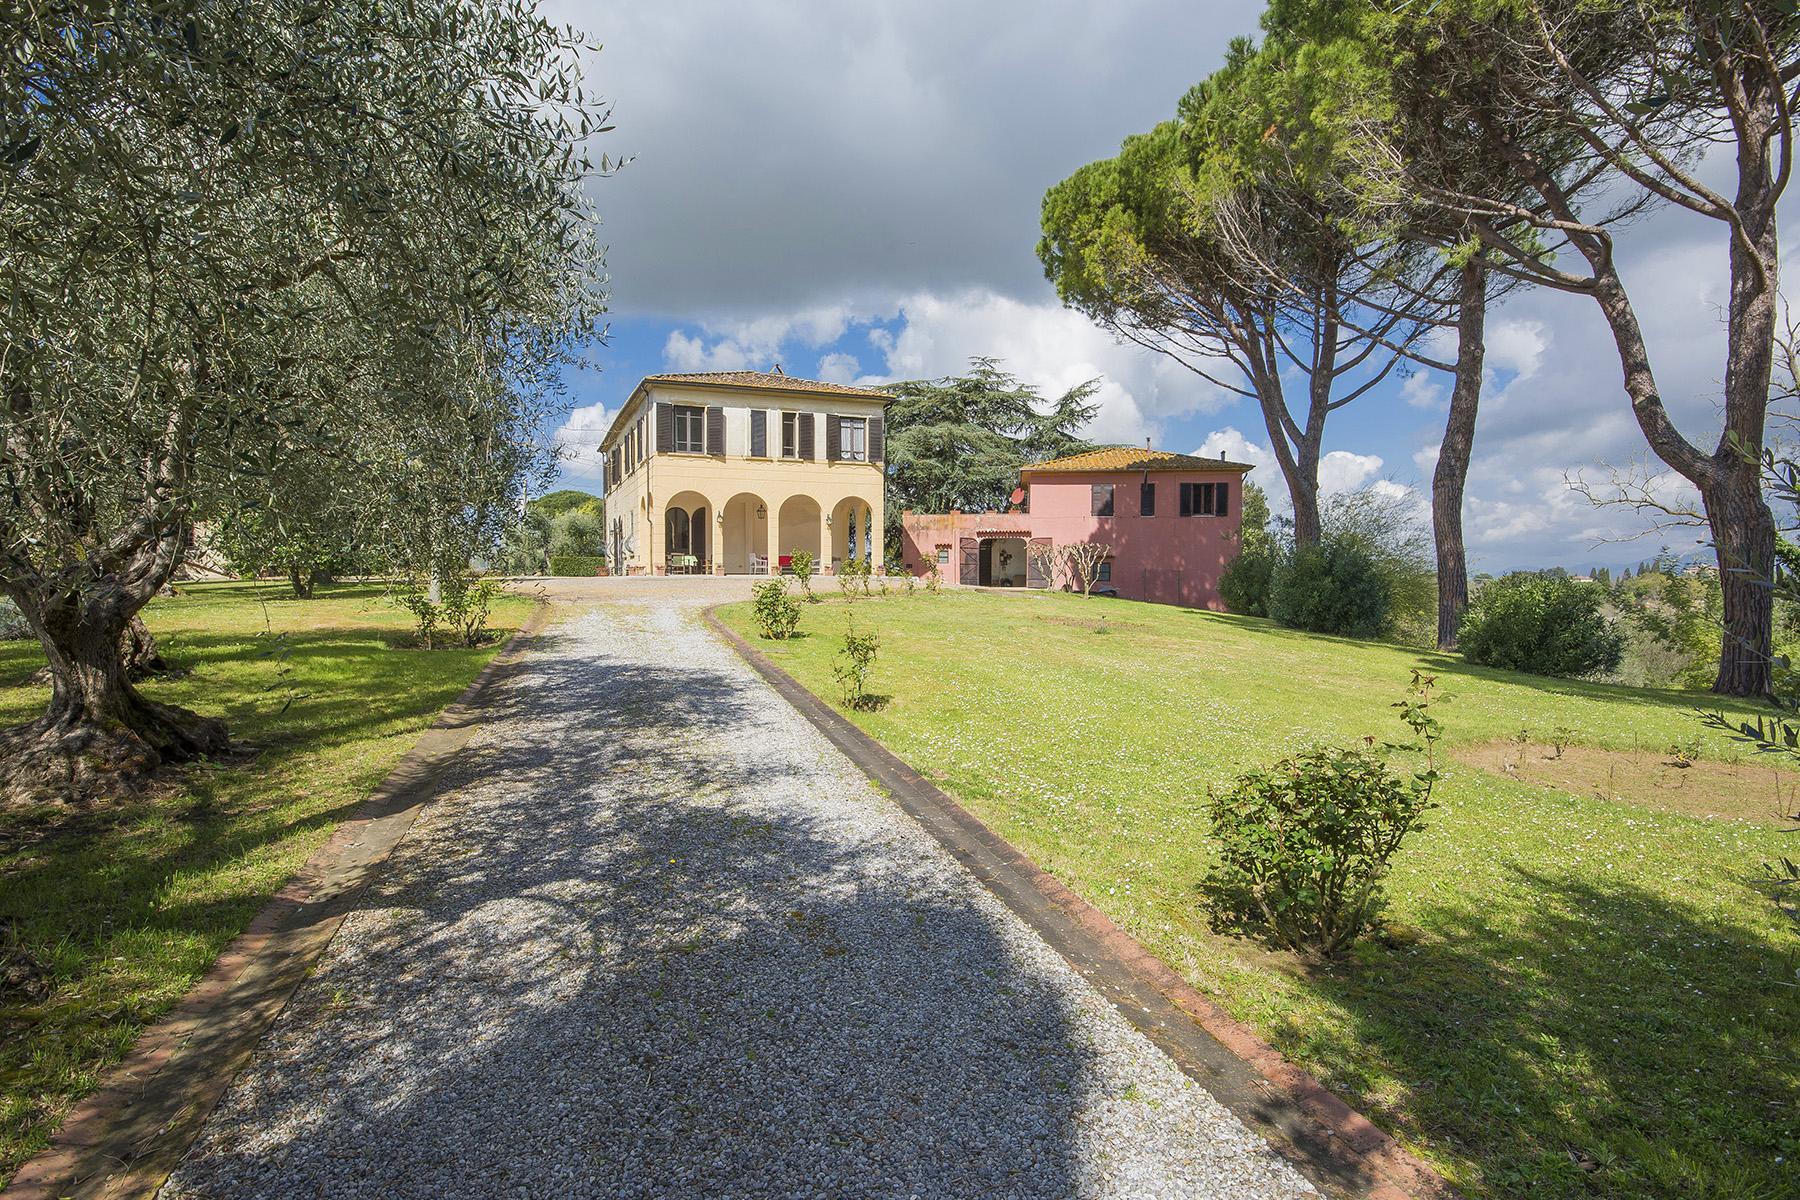 Elégante villa sur les collines toscanes - 13